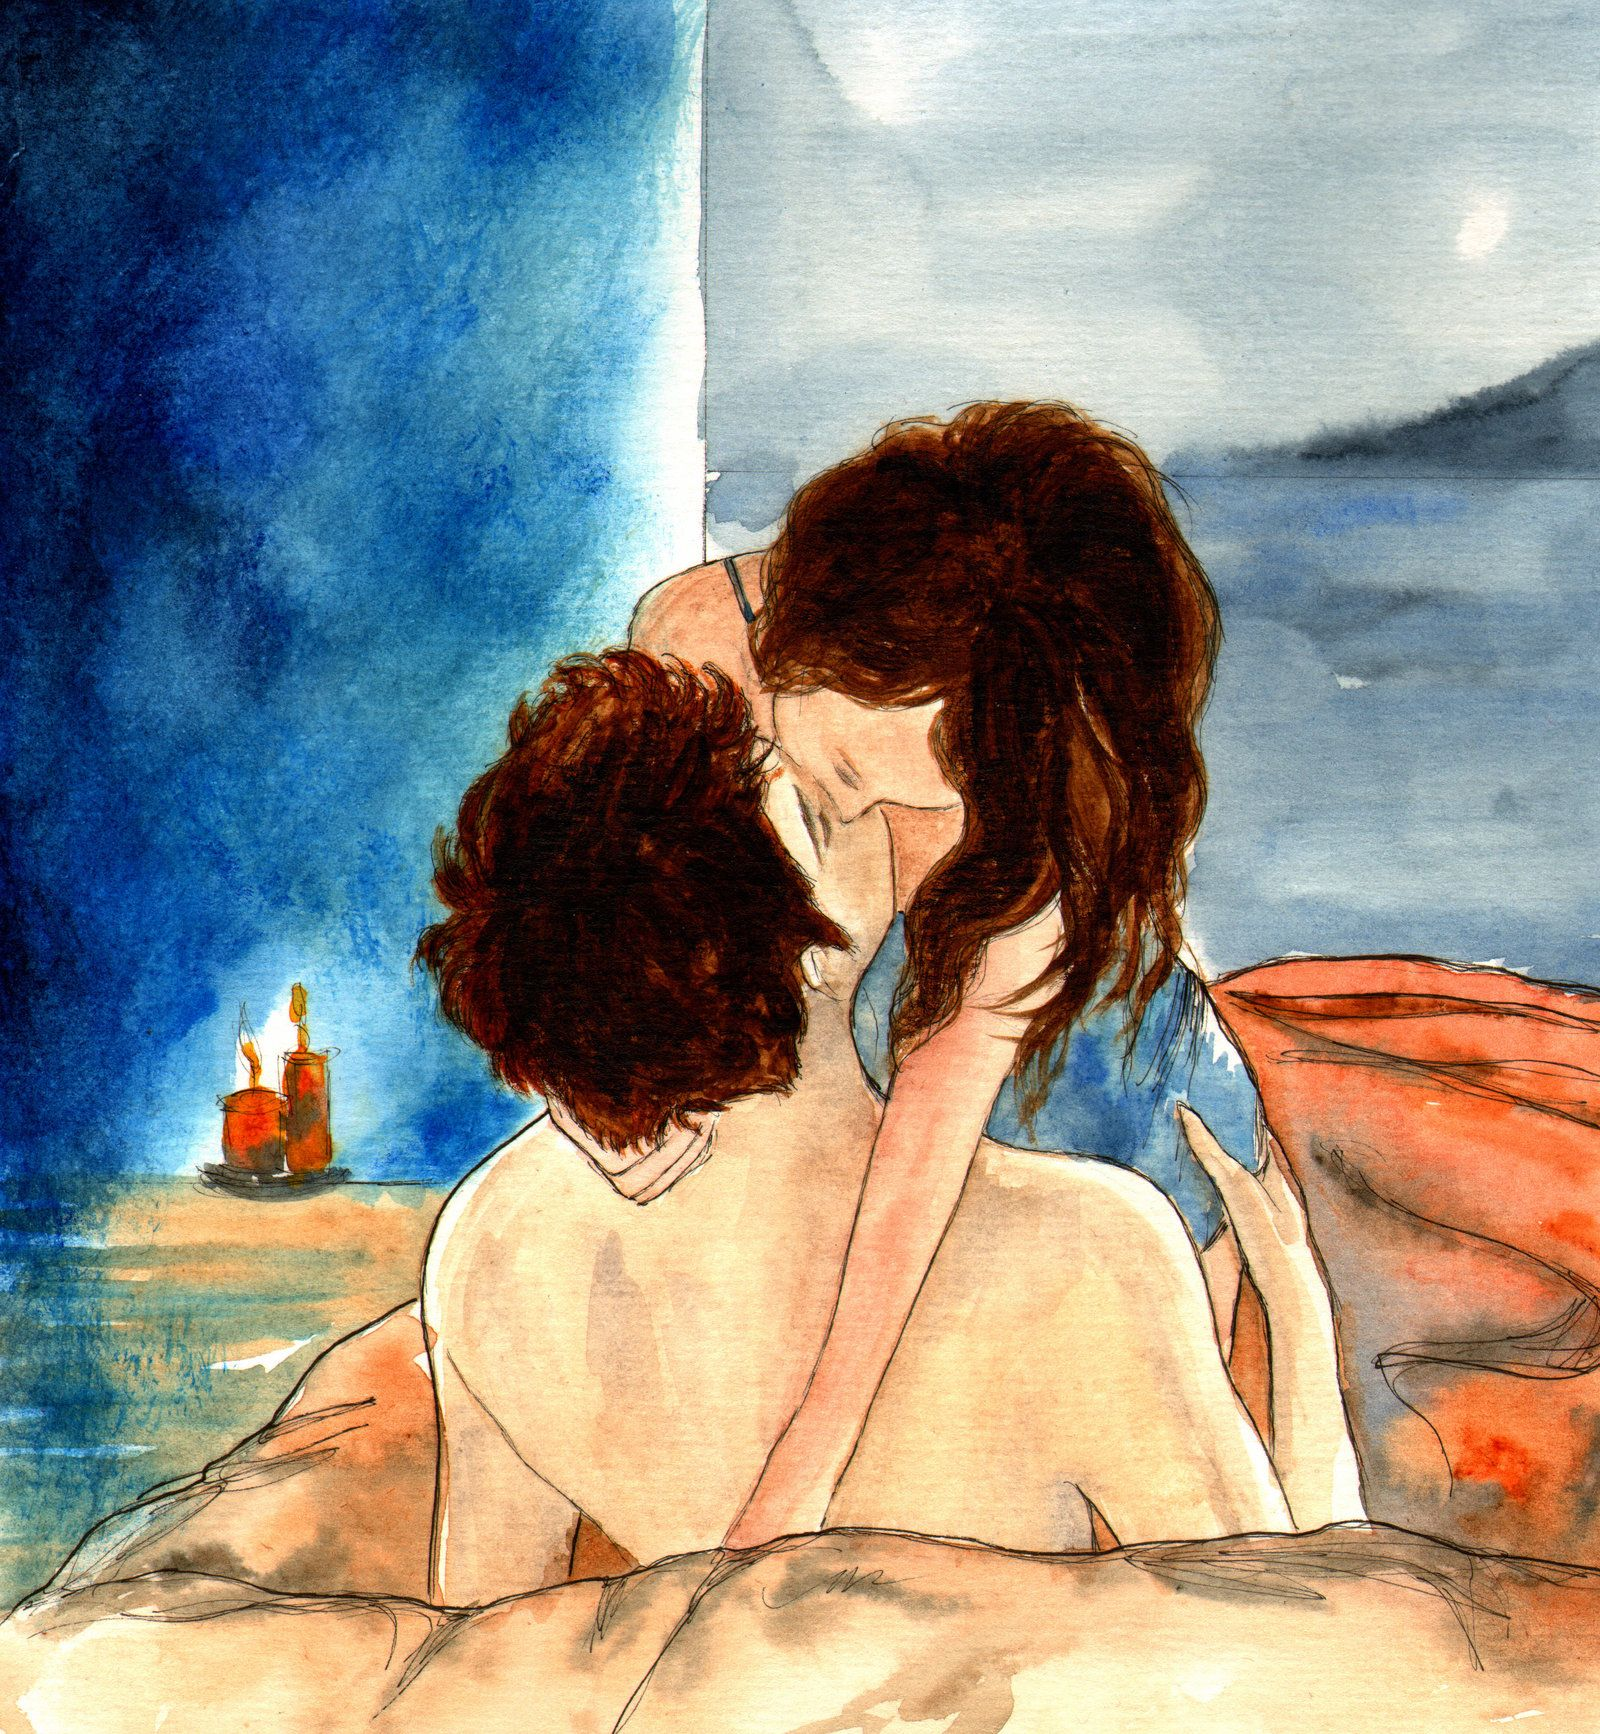 Blue Room Kiss by LittleSeaSparrow.deviantart.com on @DeviantArt